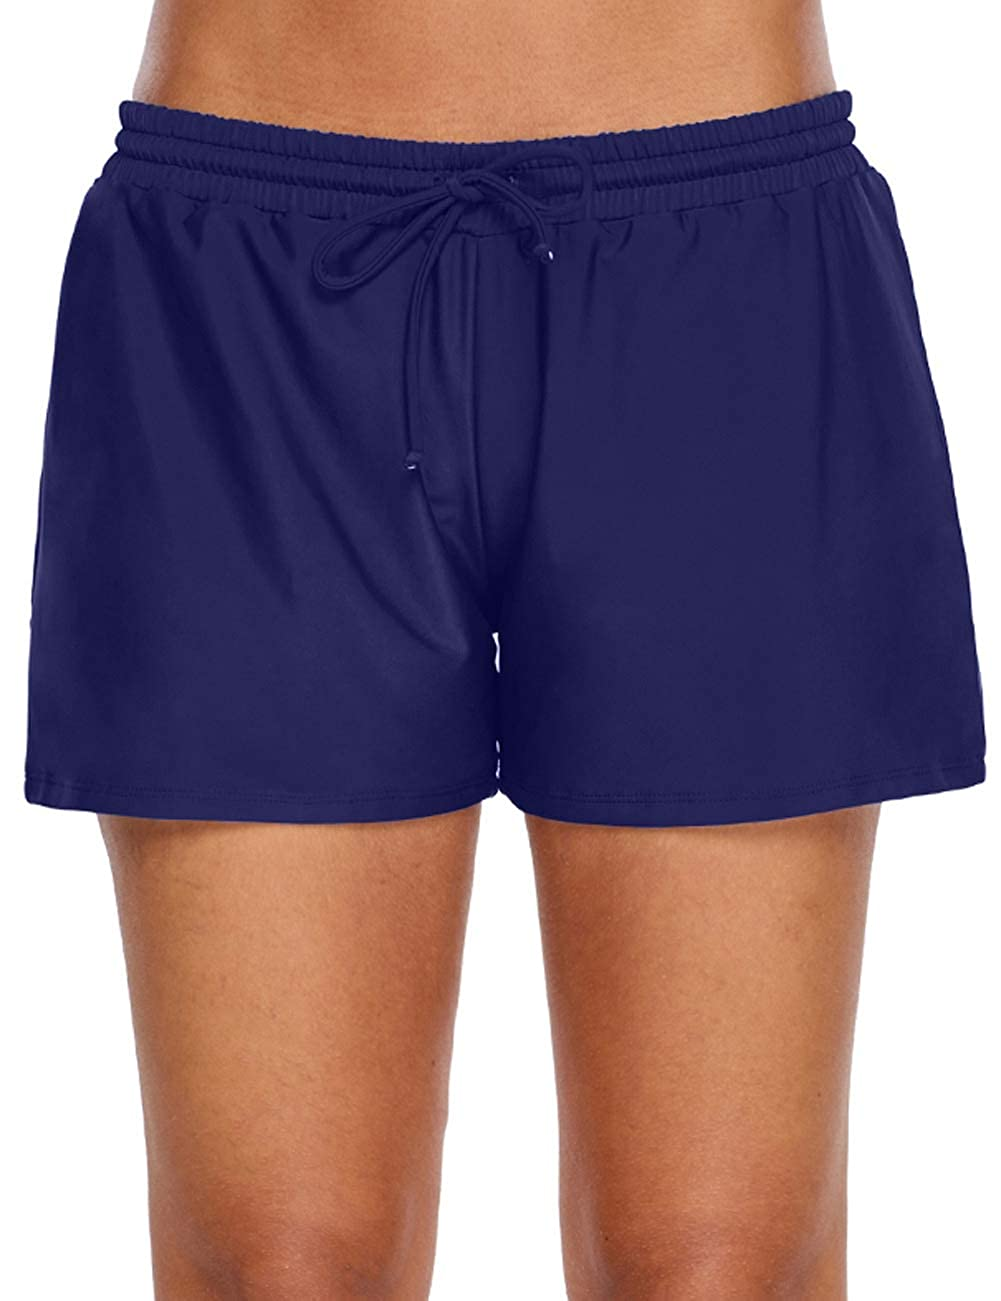 Bsubseach Womens Elastic Waistband Swimsuit Bottom Swimming Shorts Plus Size S-3XL